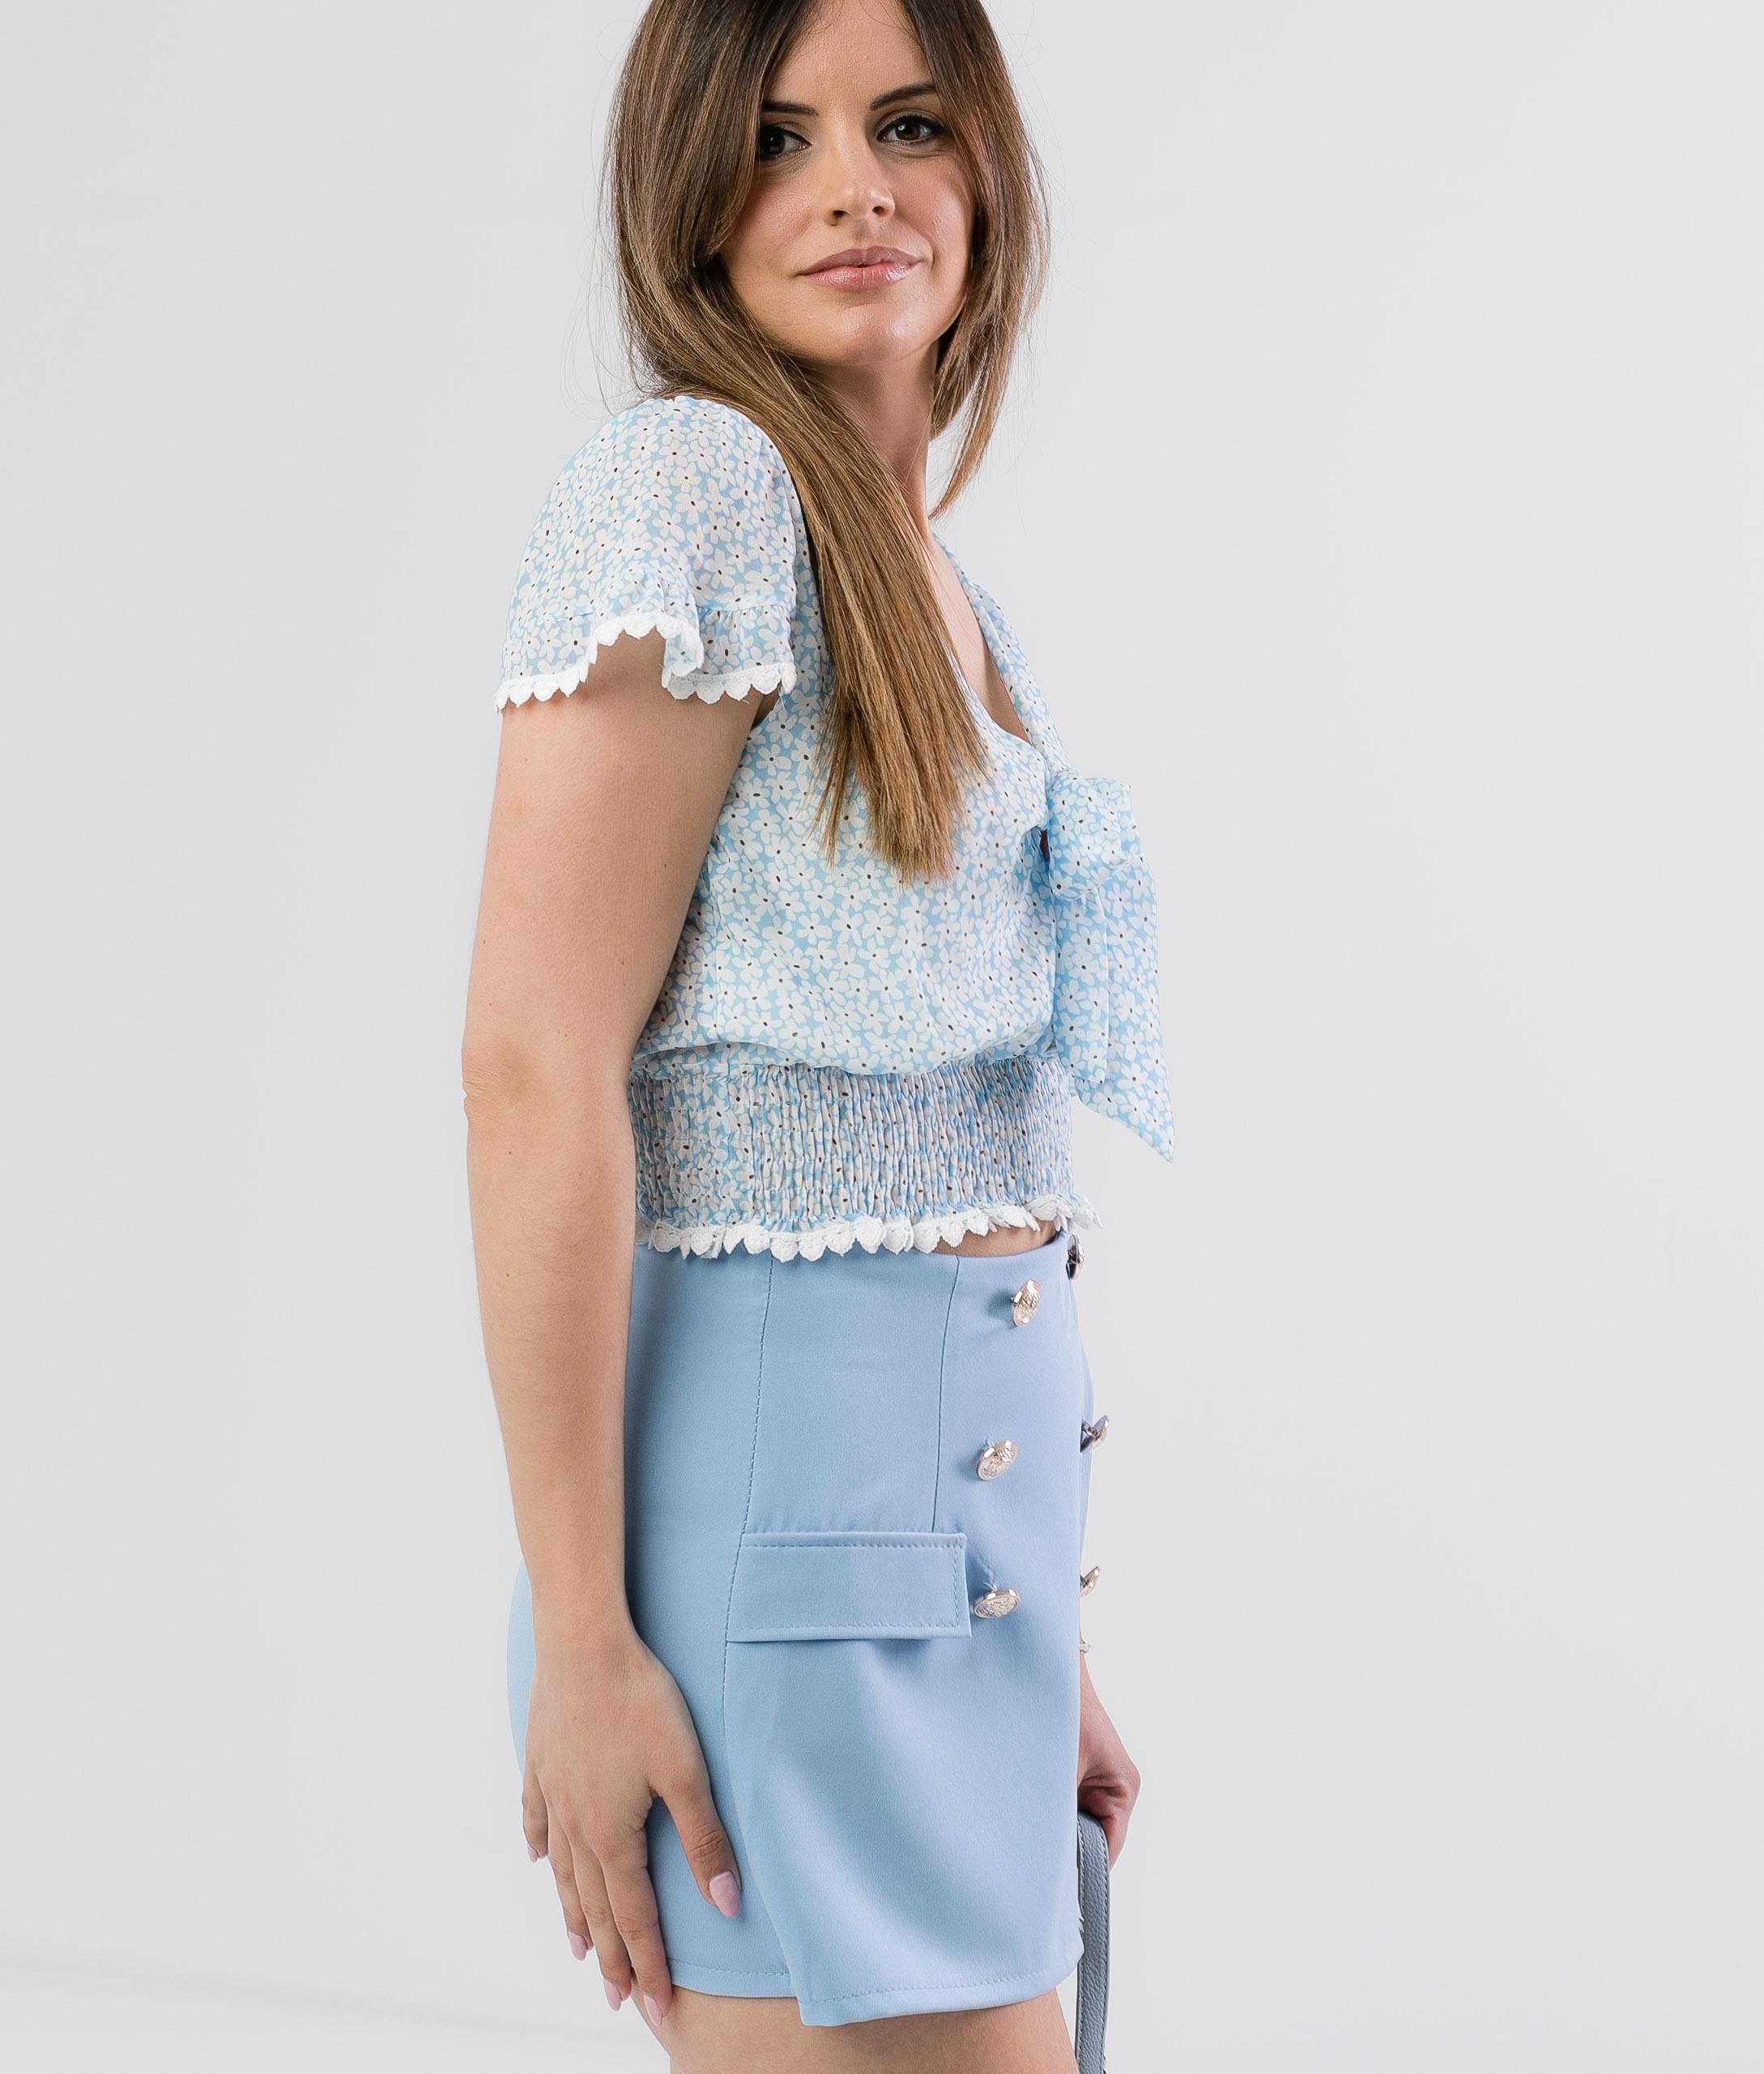 SKIRT PANTS PAREIL - BLUE